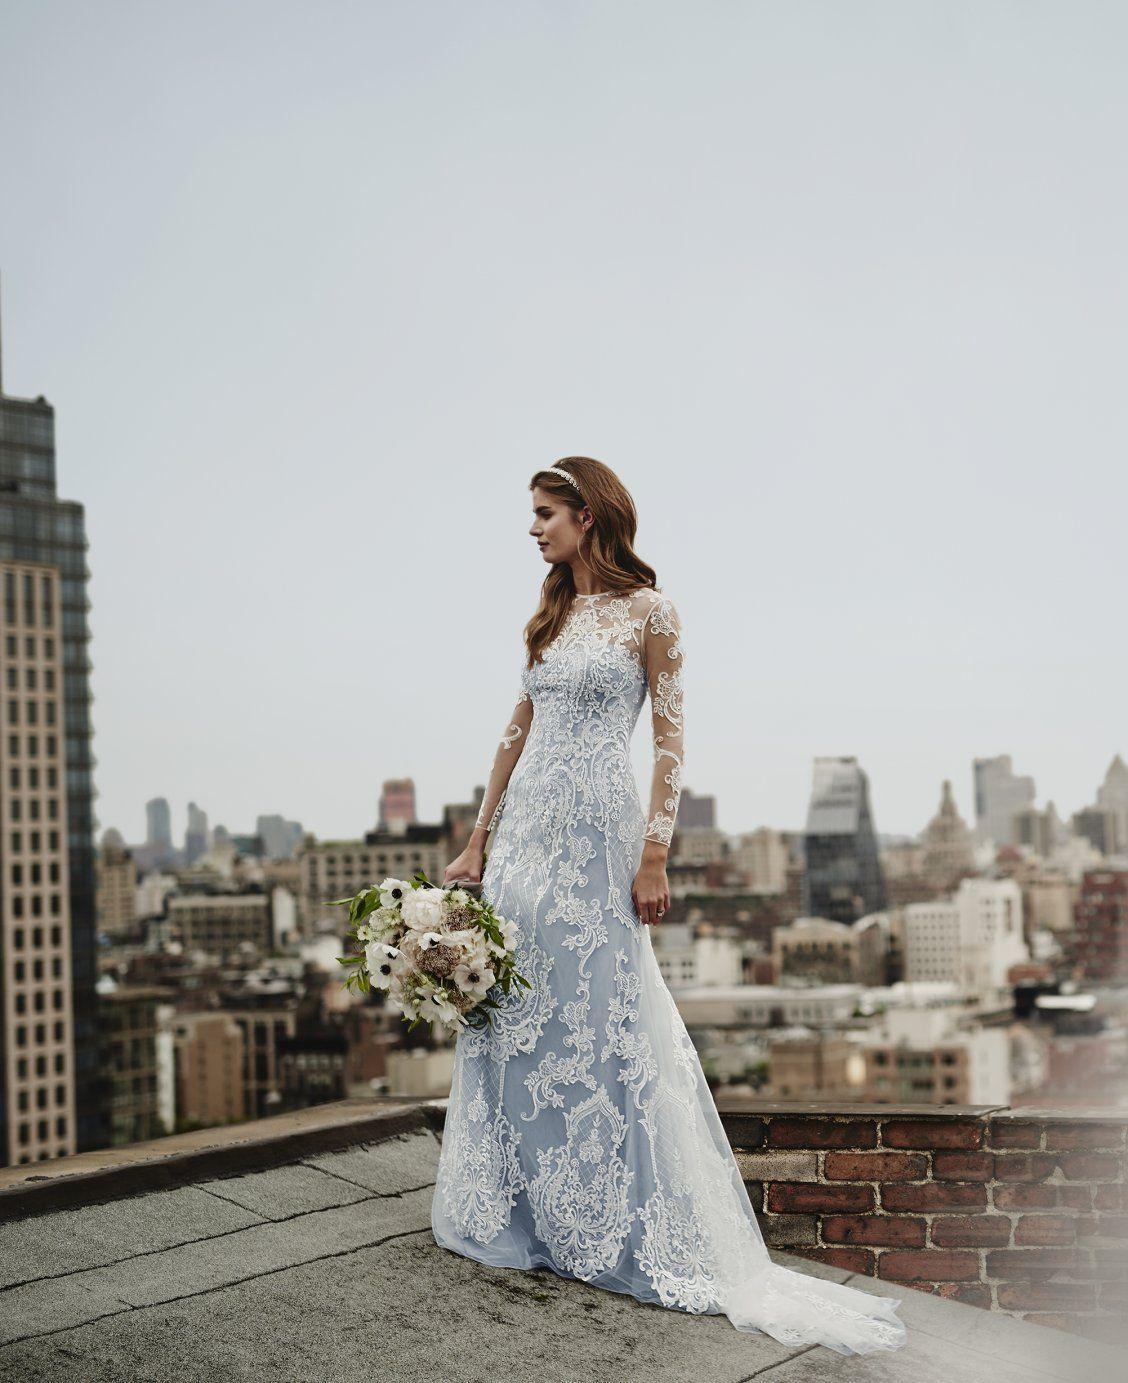 Illusion Lace Long Sleeve Sheath Wedding Dress David S Bridal Long Sleeve Sheath Wedding Dress Lacey Wedding Dress Wedding Dresses [ 1383 x 1128 Pixel ]